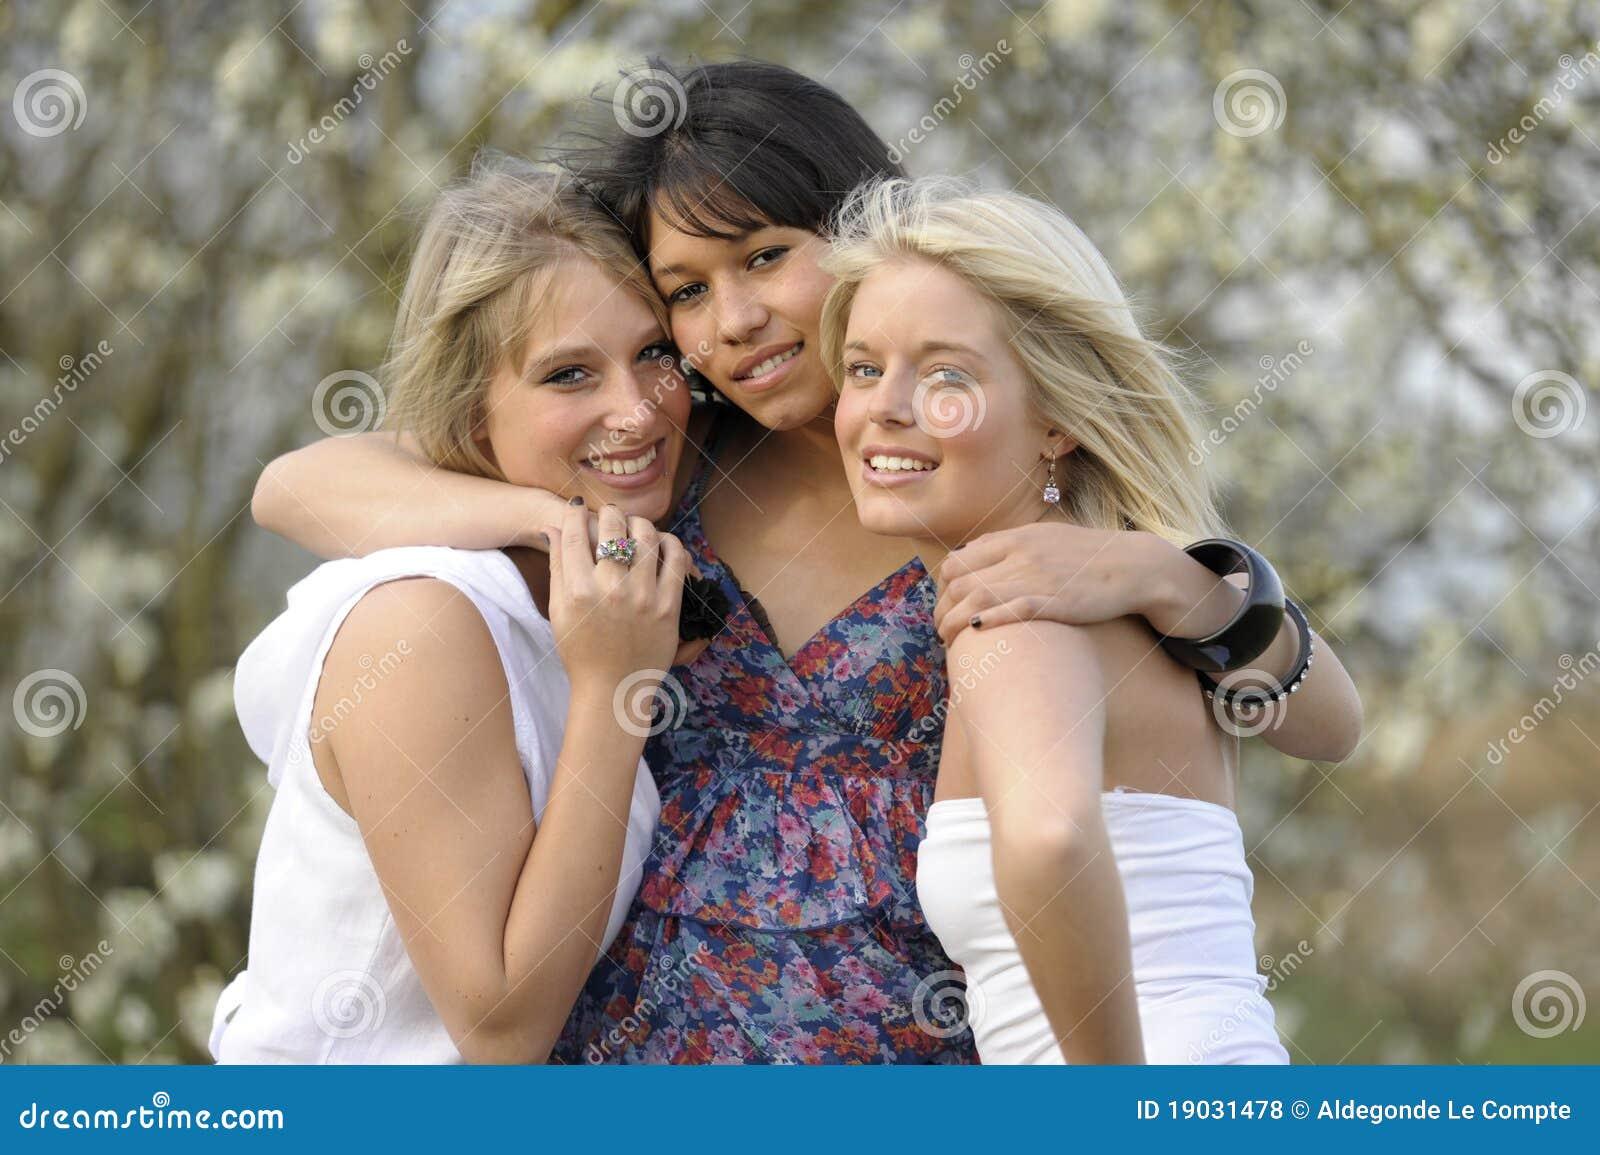 Sexy woman friends